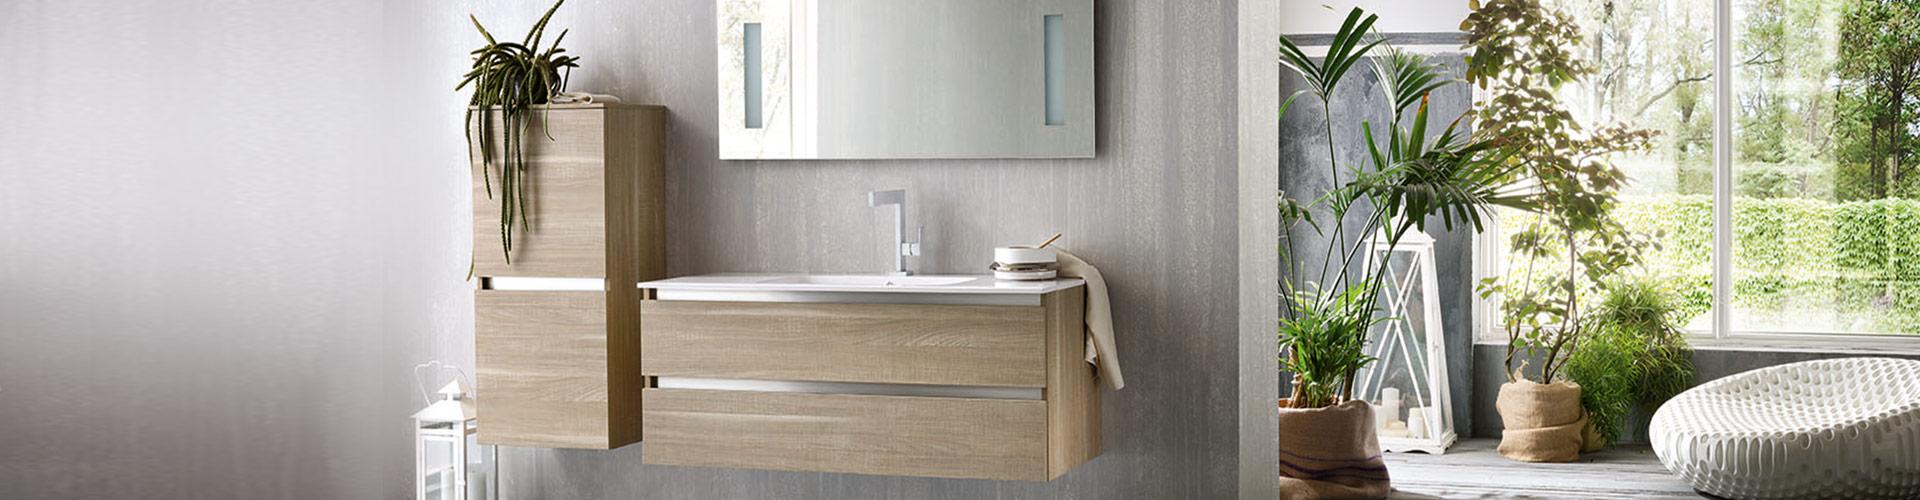 Idealbagni - Banyo Dolabı